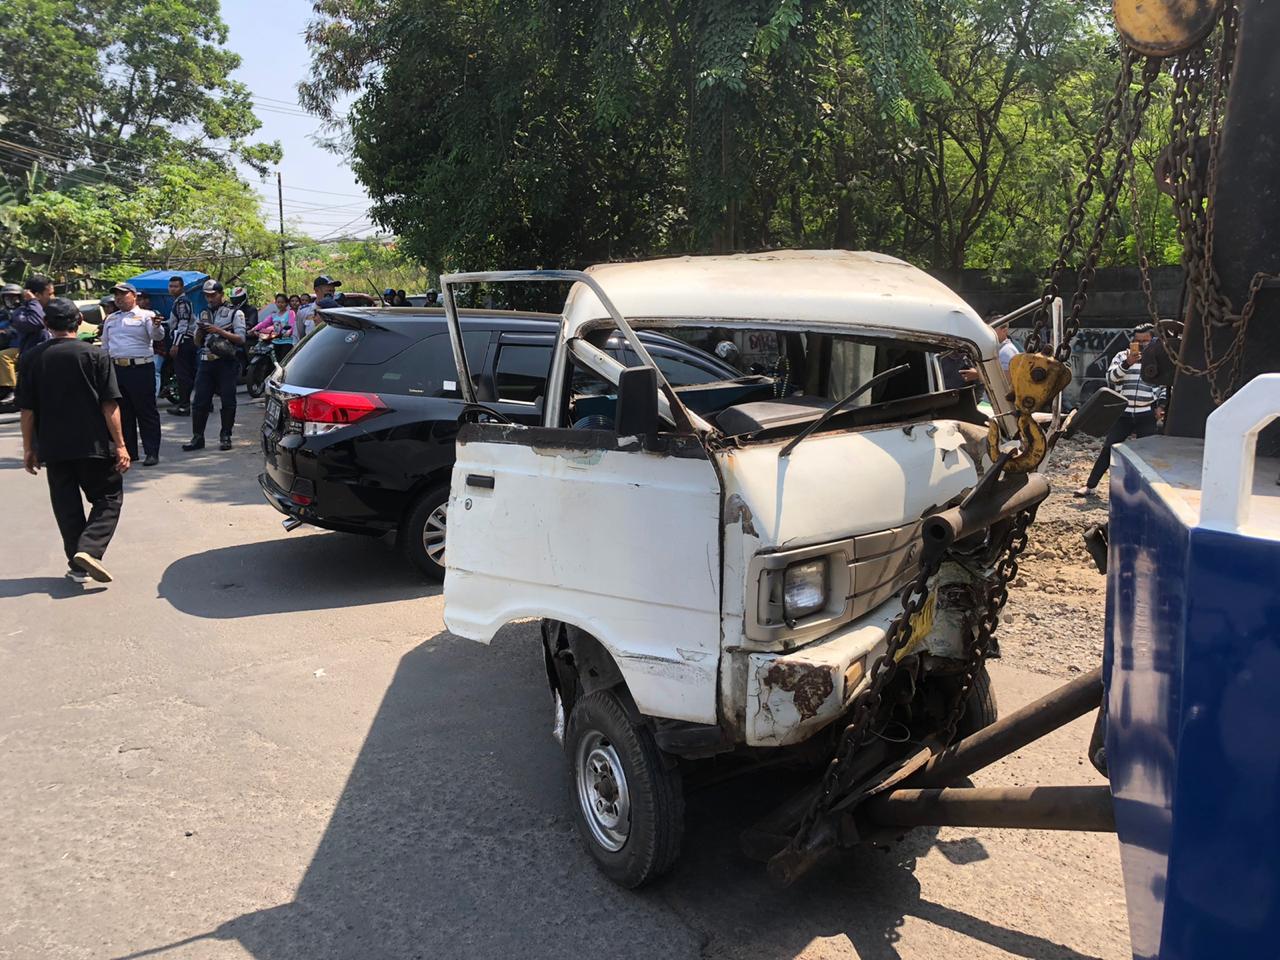 Terlihat mobil mini bus dan angkot rusak berat setelah mengalami kecelakaan tabrakan di depan gerbang Perumahan Villa Pamulang, Jalan Raya Puspitek, Pamulang, Tangerang Selatan.